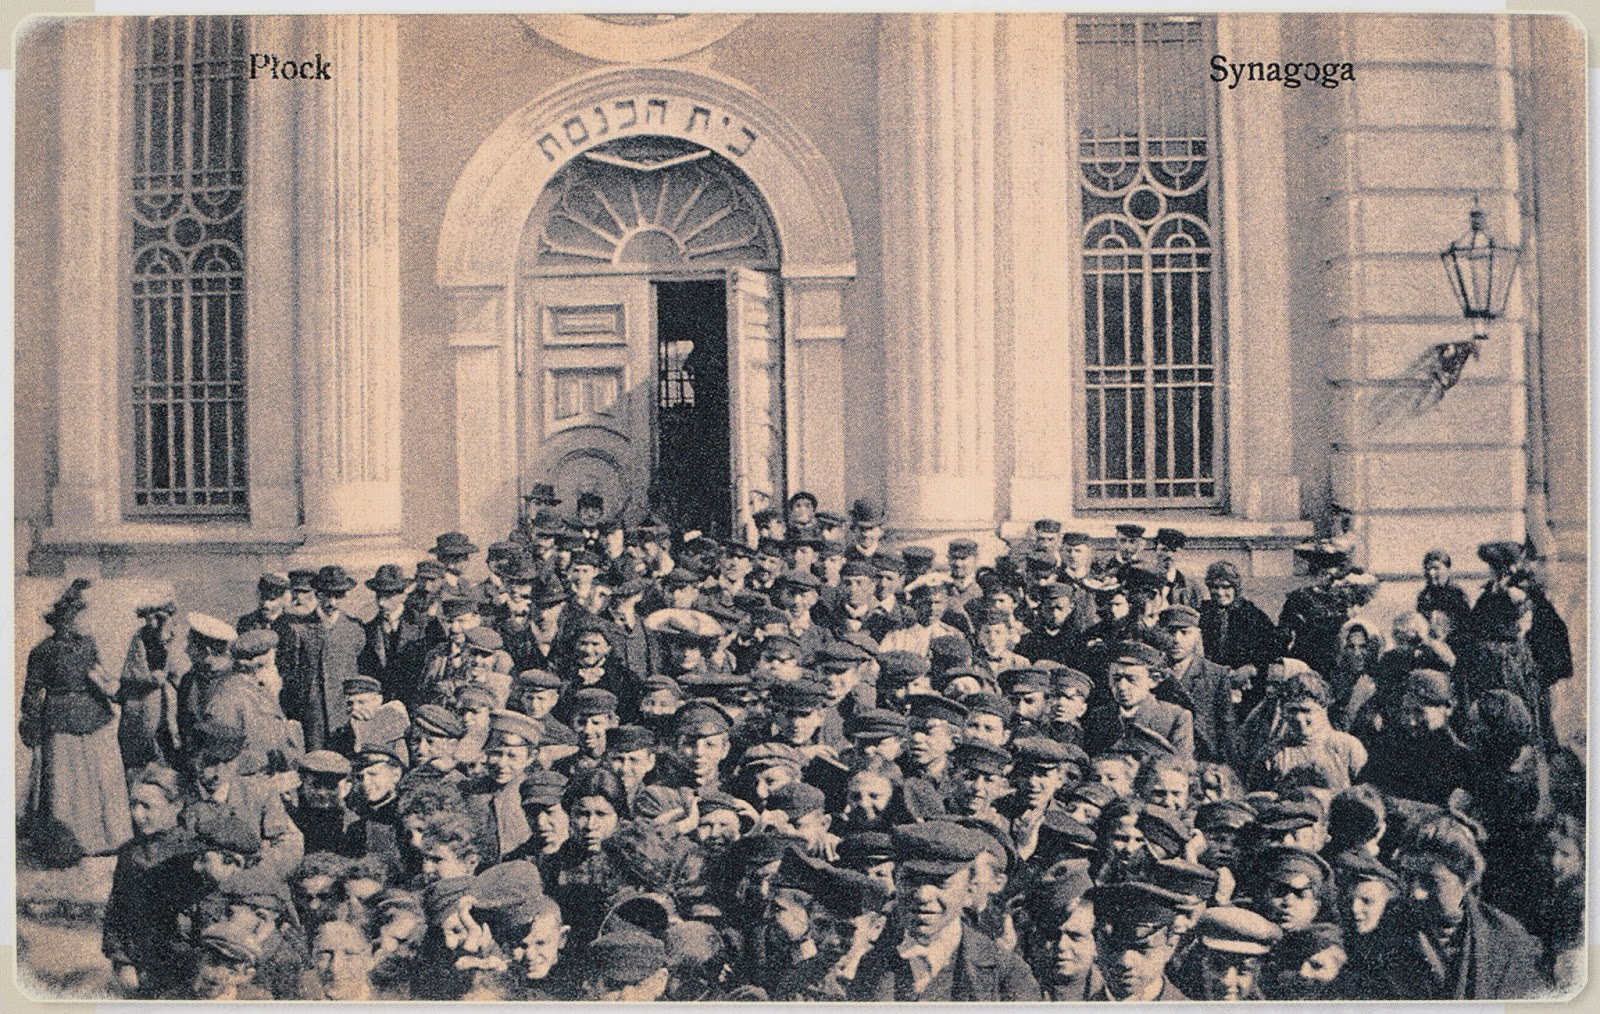 http://3.bp.blogspot.com/-nNQcA6t5kPQ/UT4g4mnSjUI/AAAAAAAAZ0E/QG08Z9T850c/s1600/Plock_Poland-Synagogue_photo_early-20th_century_frm_V_Likhodedov_Synagogues_p194.JPG